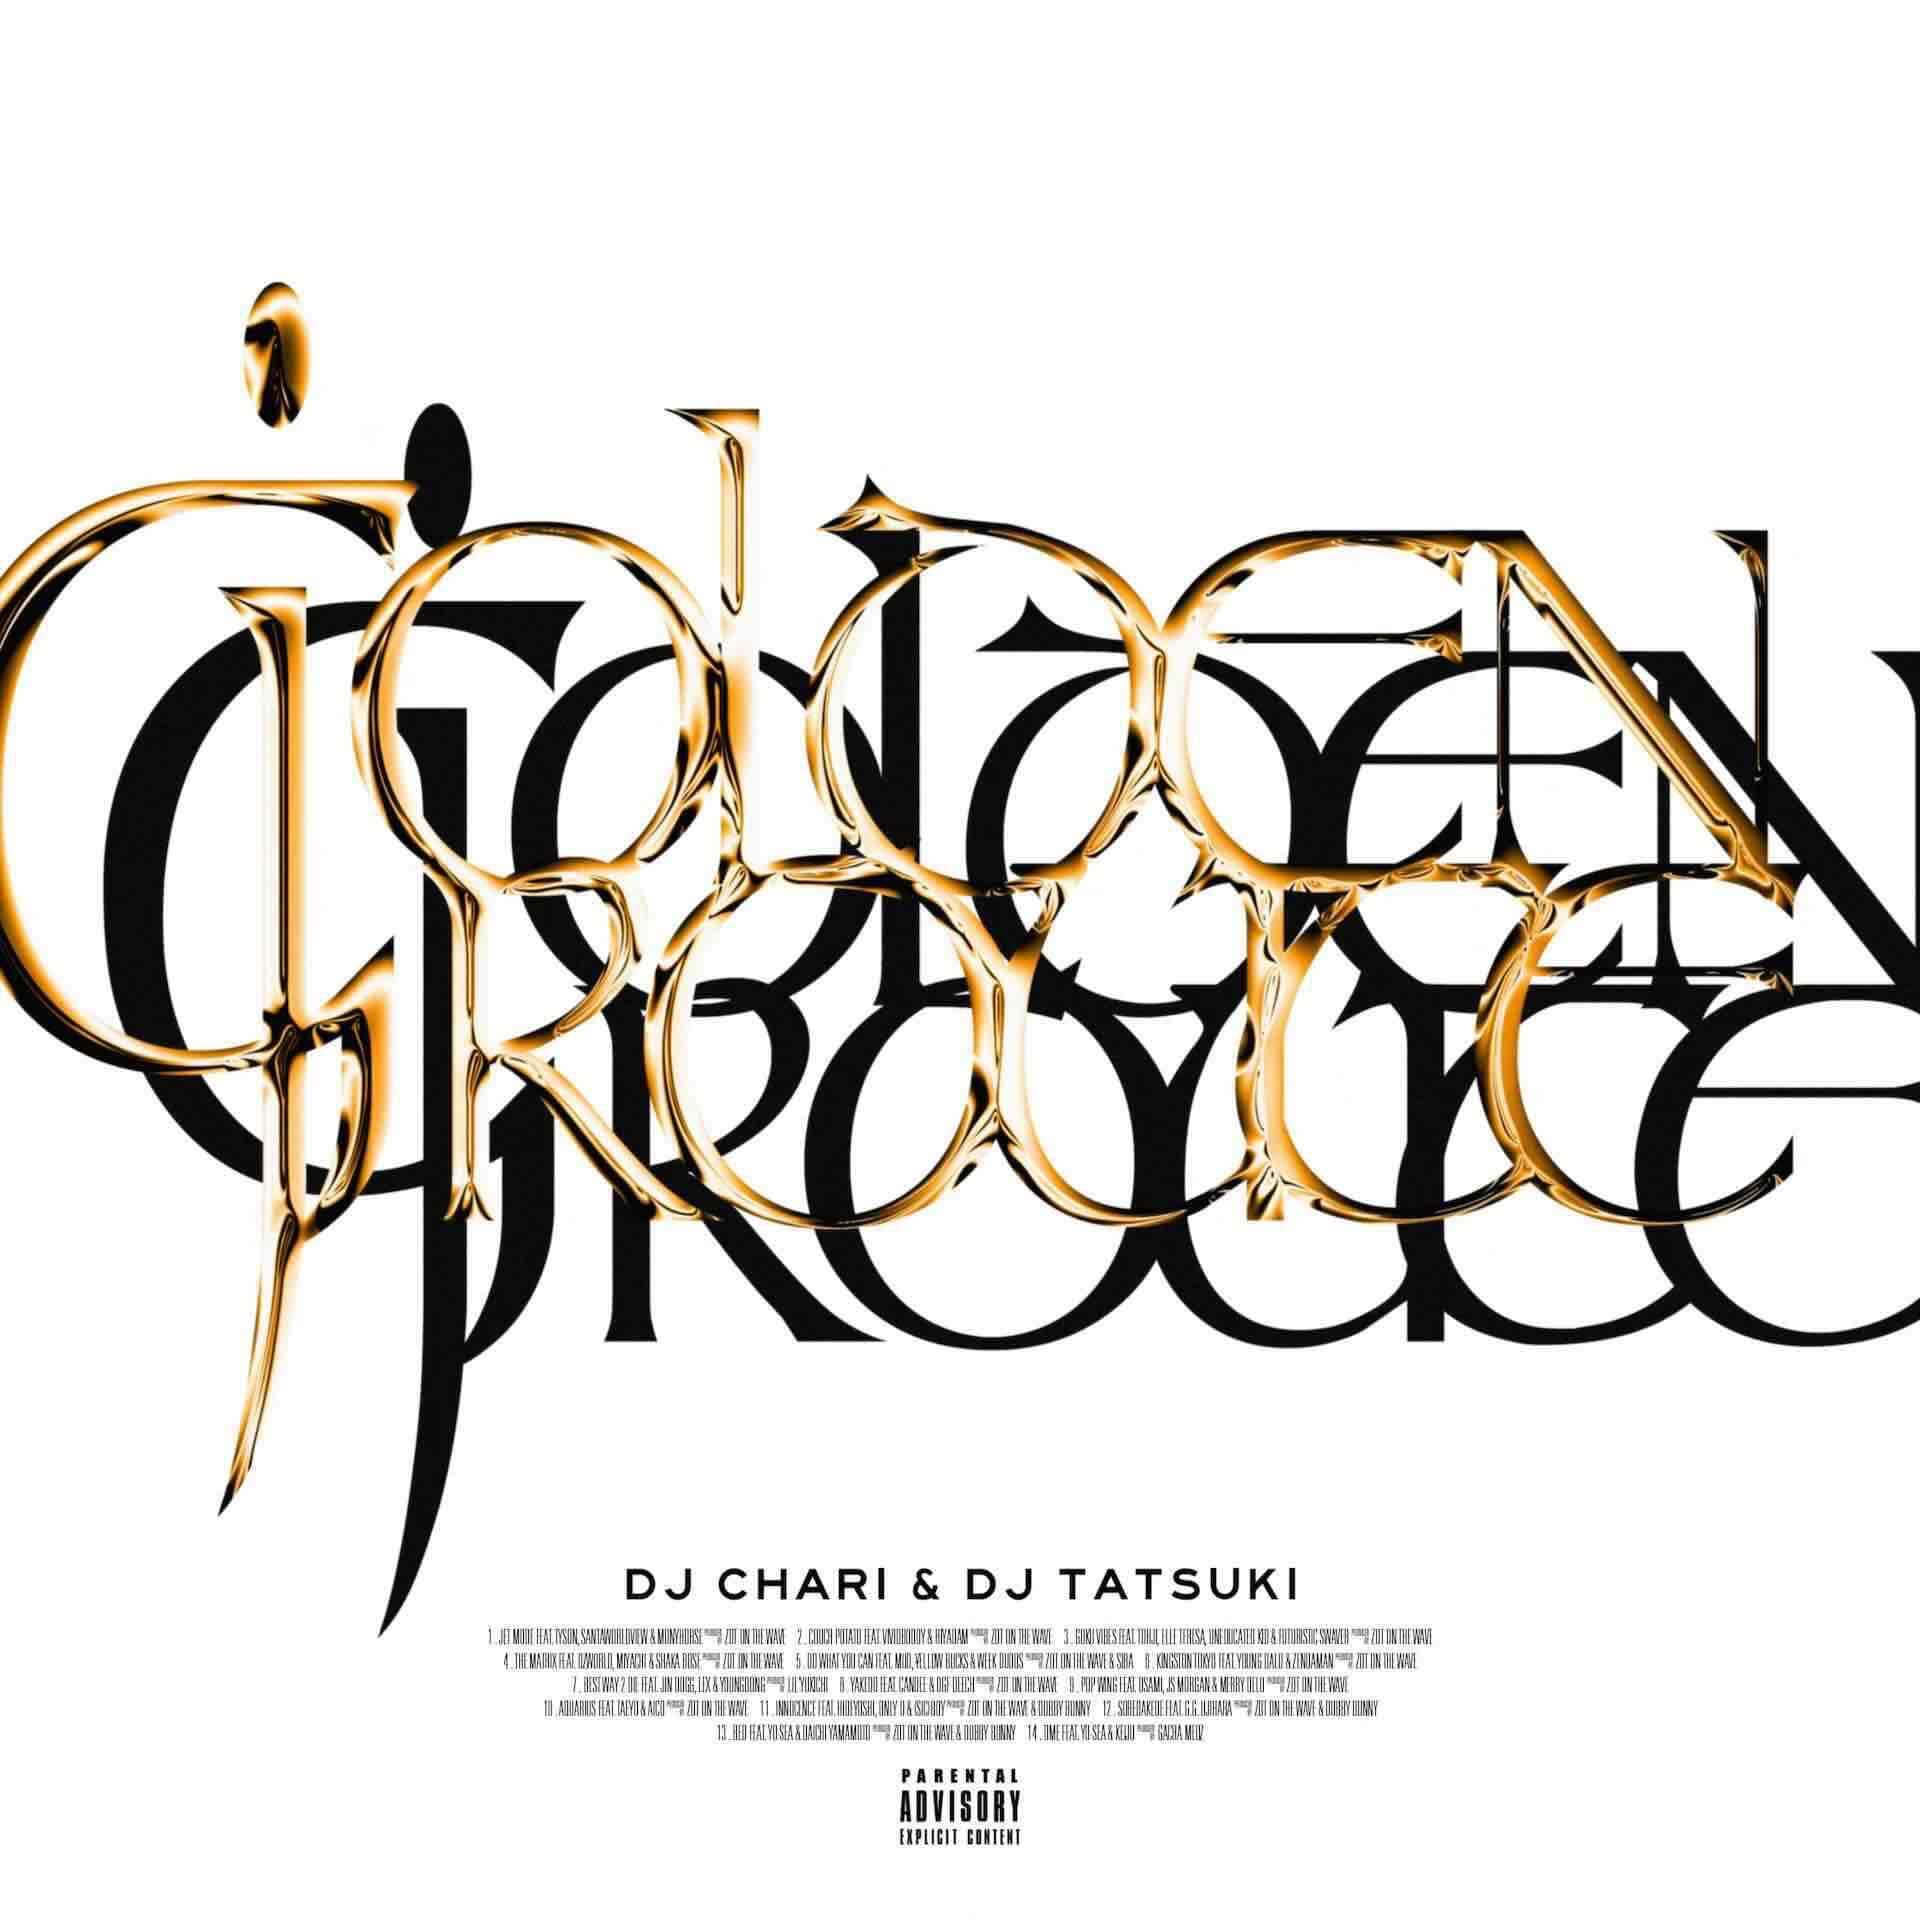 DJ CHARI & DJ TATSUKIの新アルバム『GOLDEN ROUTE』がリリース決定!Daichi Yamamoto、Yo-Sea、Tohjiらが参加 music201211_djchari-djtatsuki_3-1920x1920